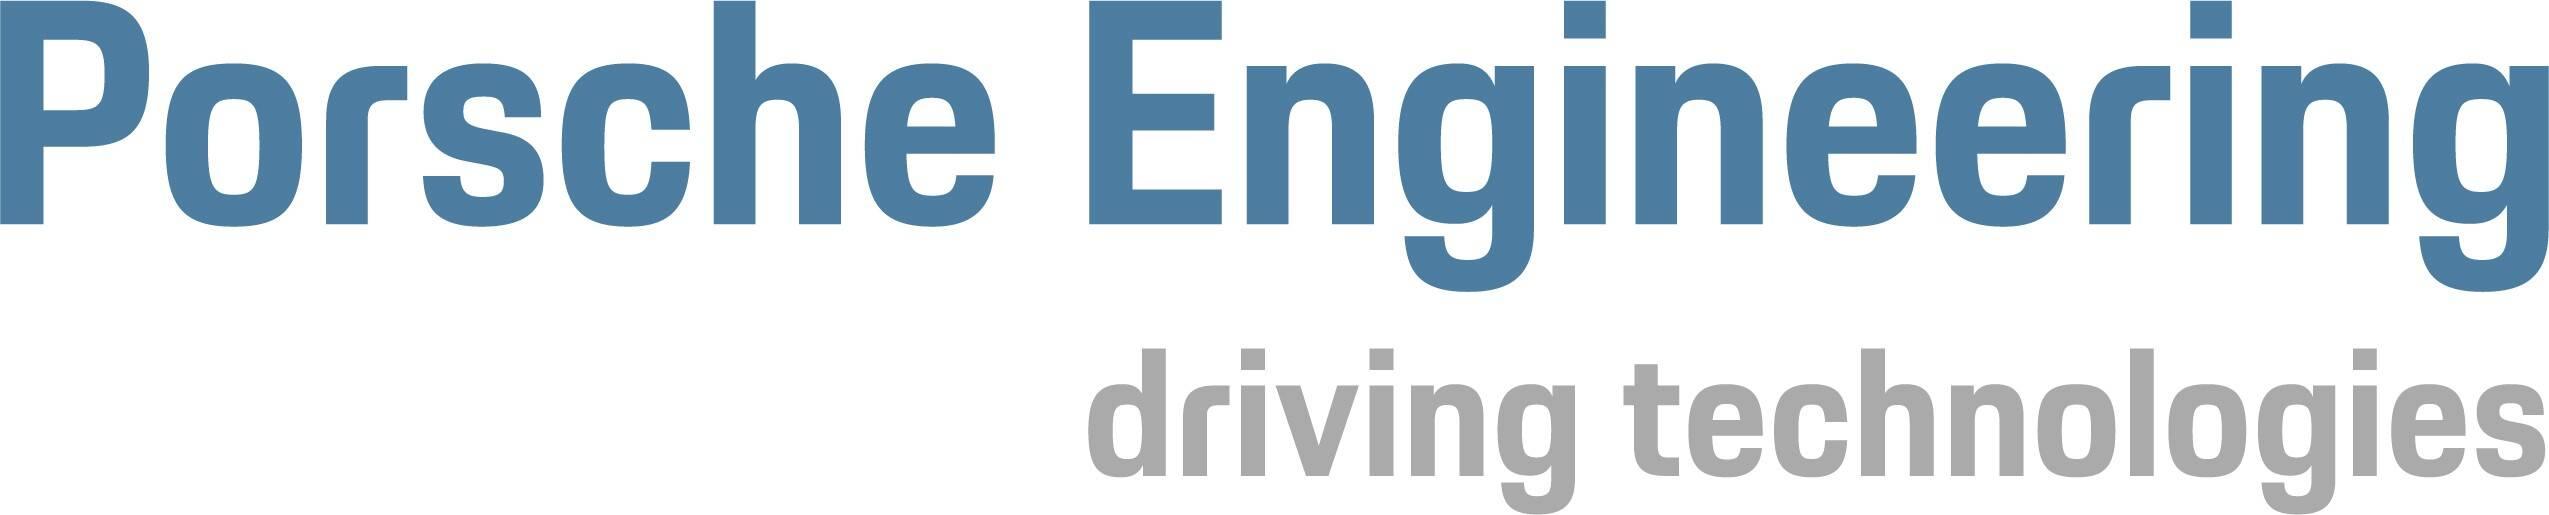 Porsche Engineering Services, s.r.o.